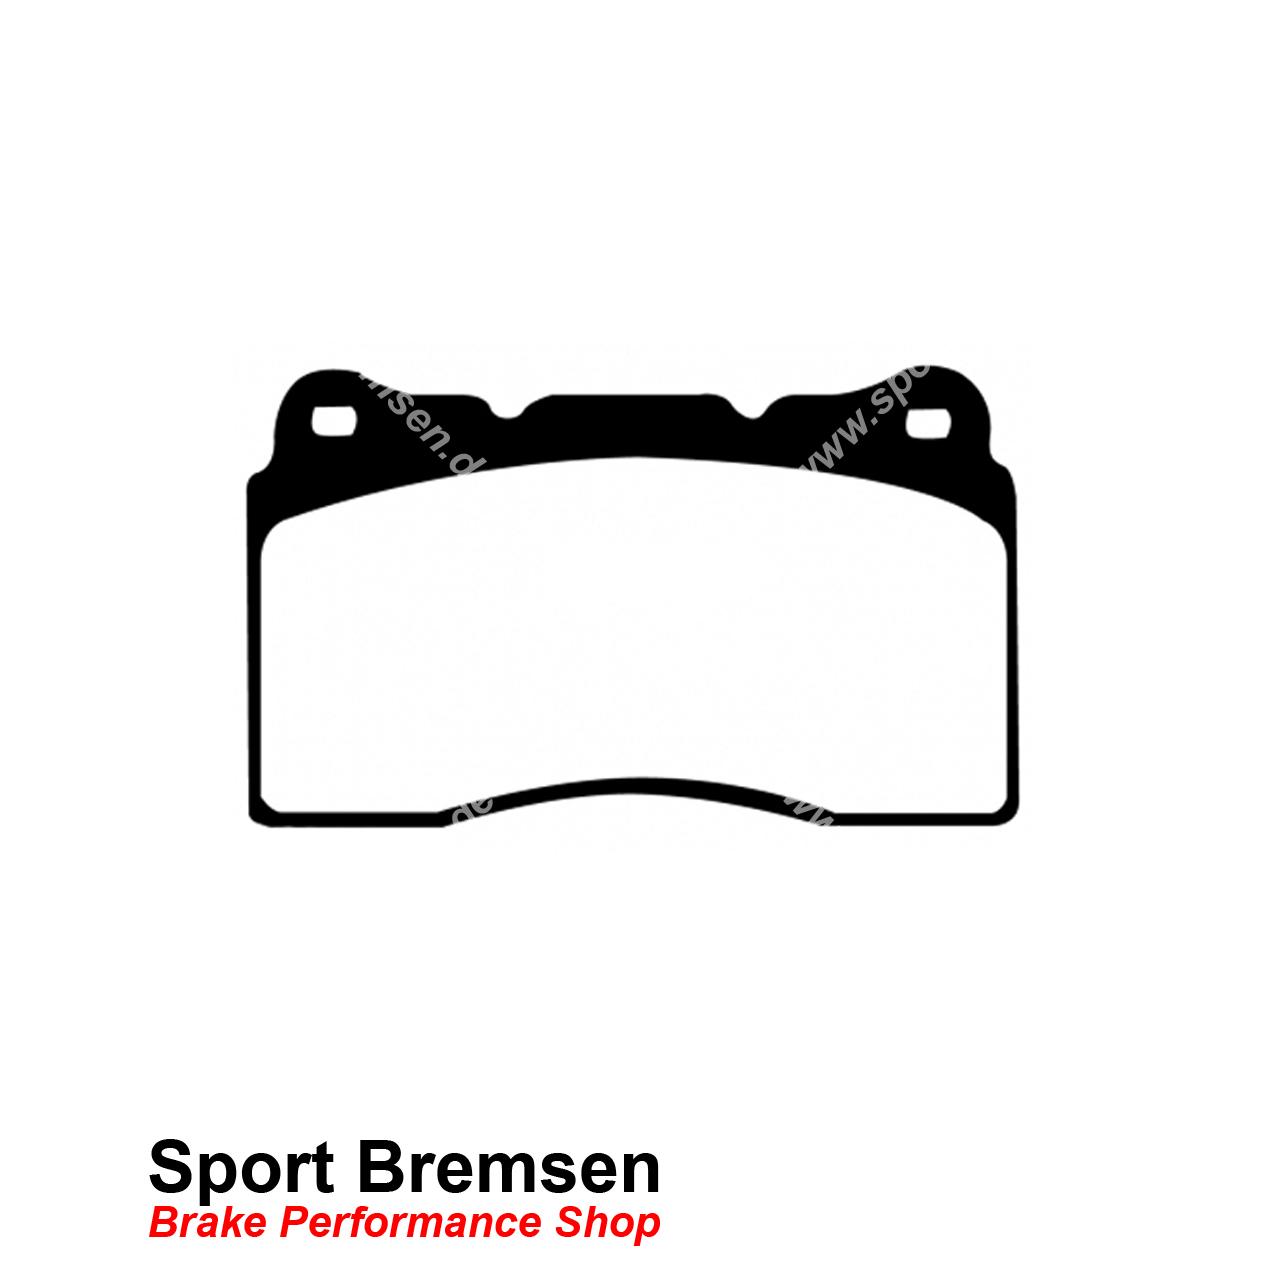 Ebc Redstuff Bremsbelage Fur Subaru Impreza Dp C Vorne